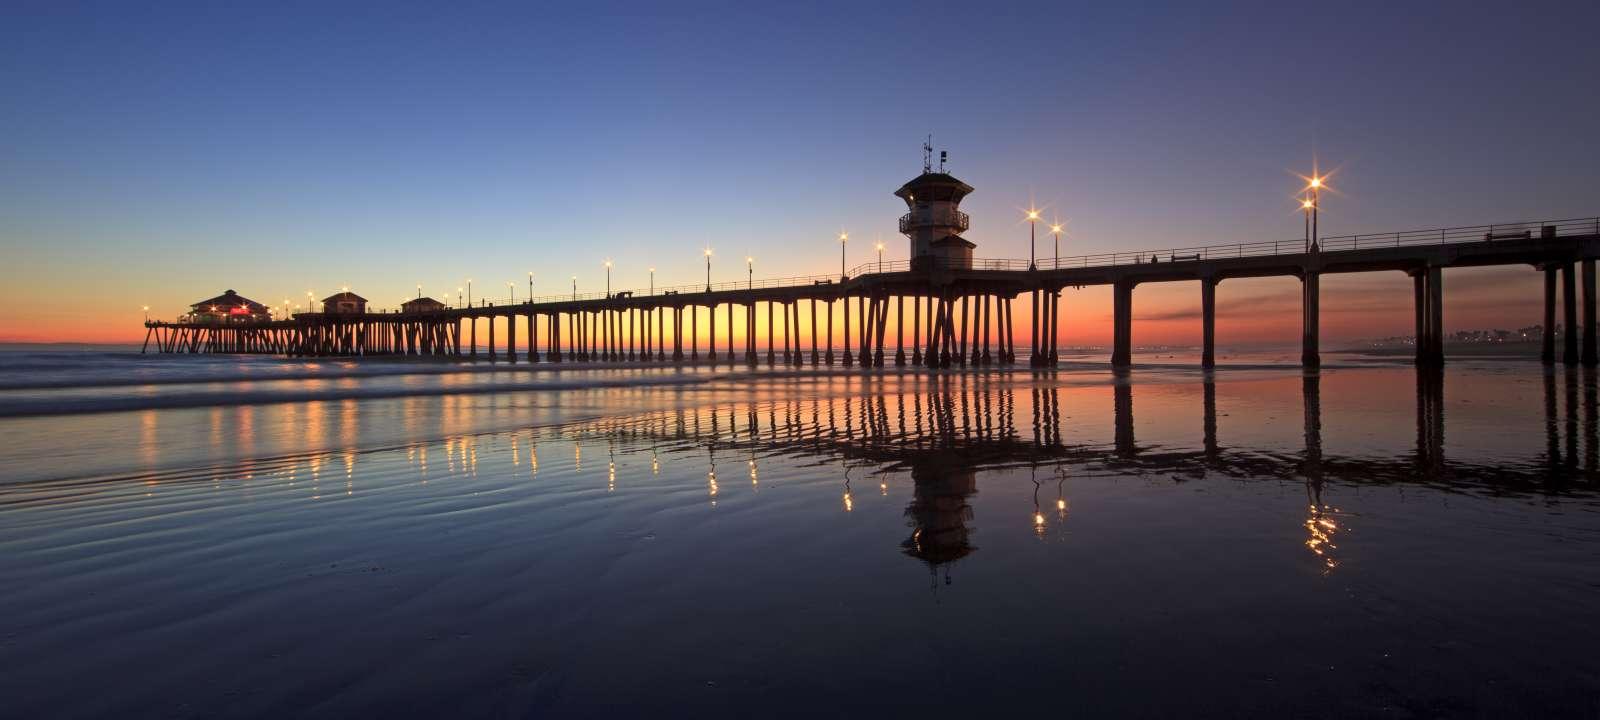 Restaurant In Huntington Beach Pier